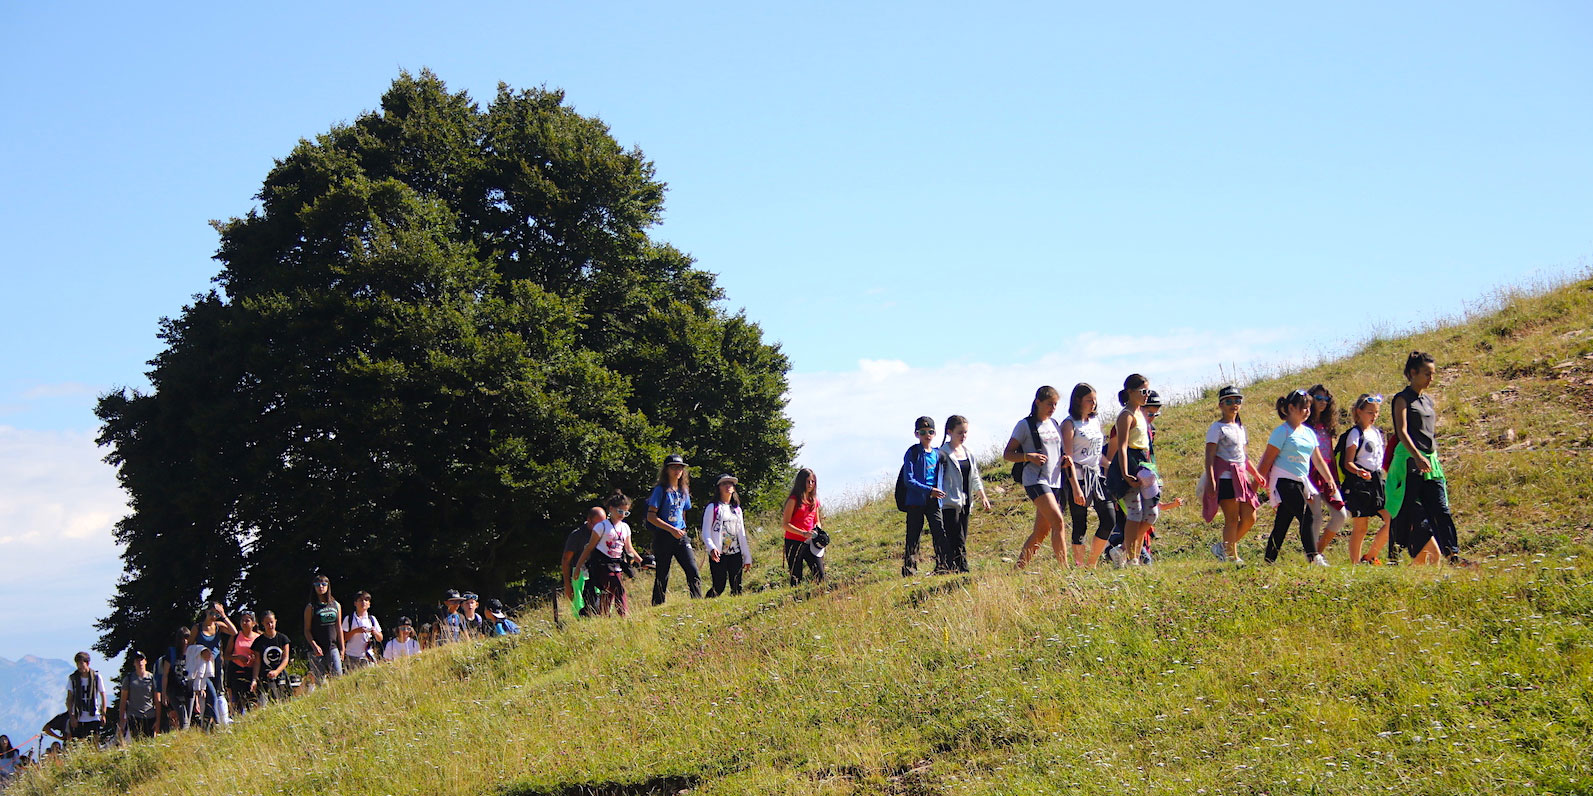 Estate-Inpsieme-2019-escursione-montagna-holiday-system